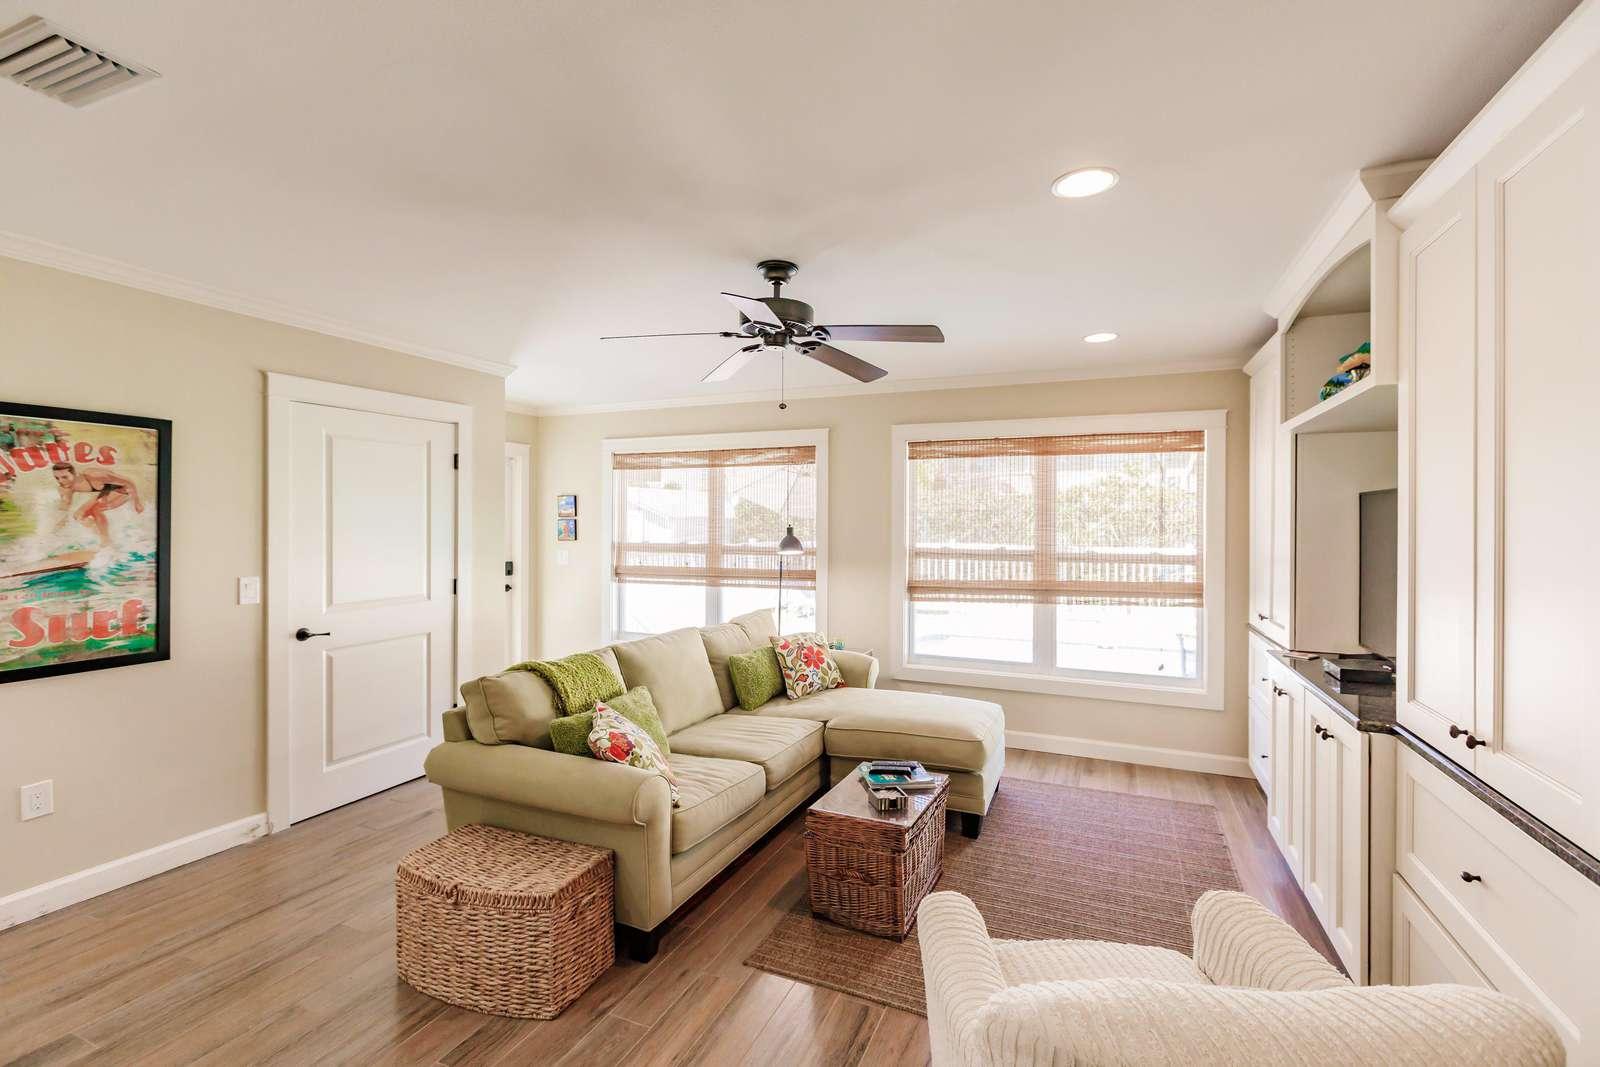 Back living room overlooking pool area